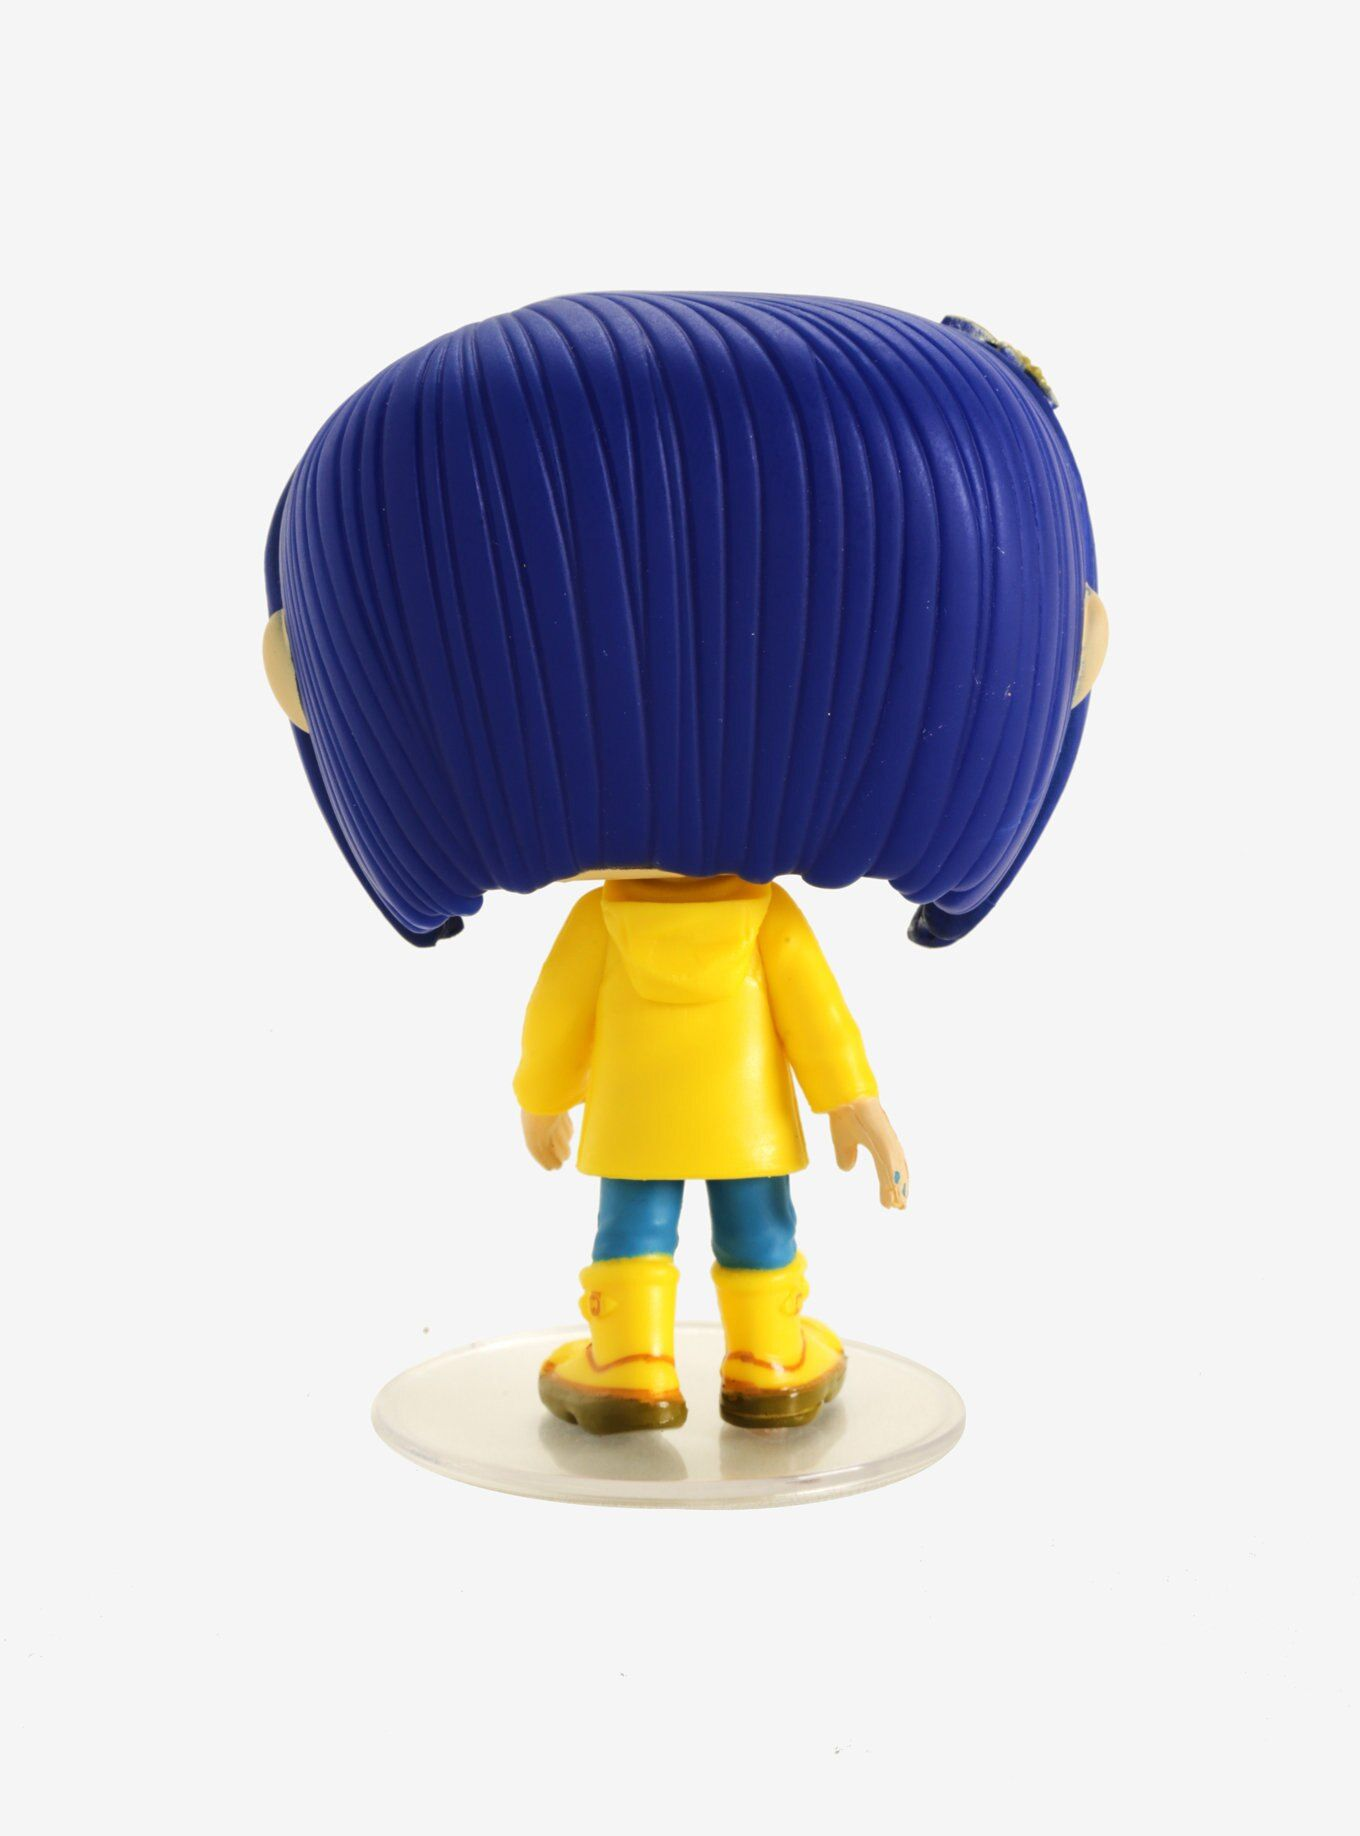 Coraline in Raincoat #423 - Funko Pop! Animation